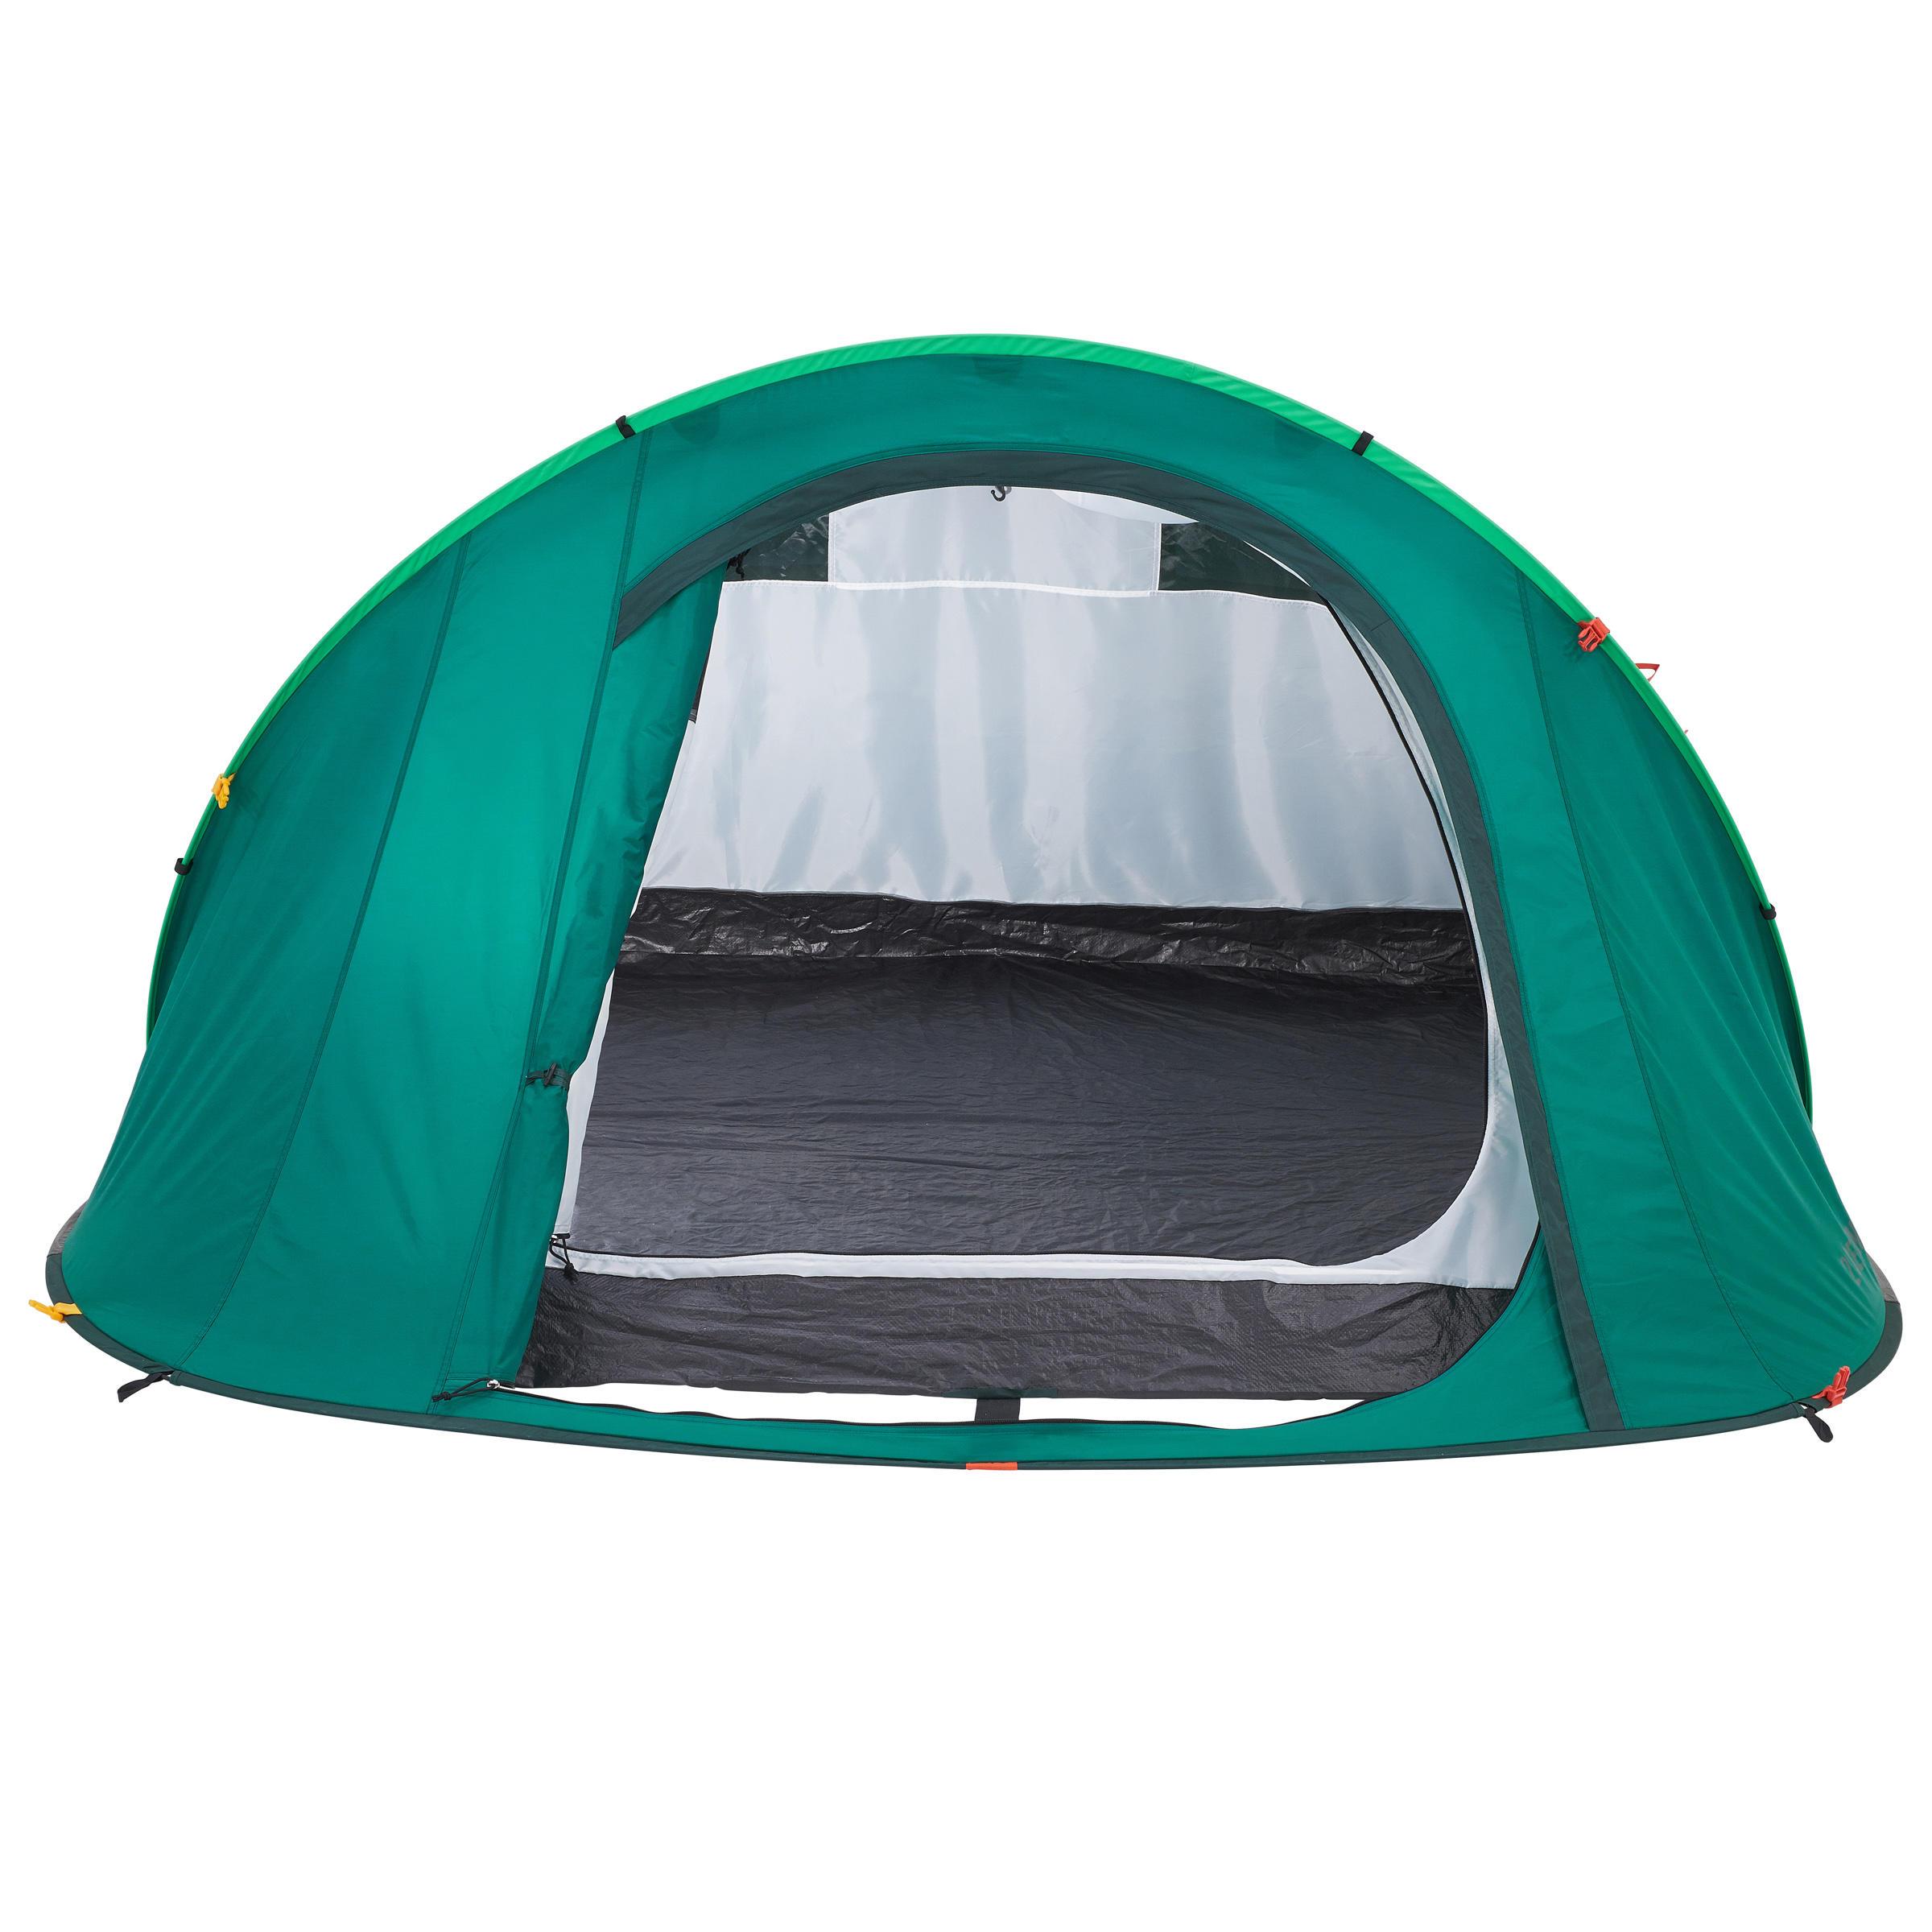 2 SECONDS Camping Tent - 3-Man - Green